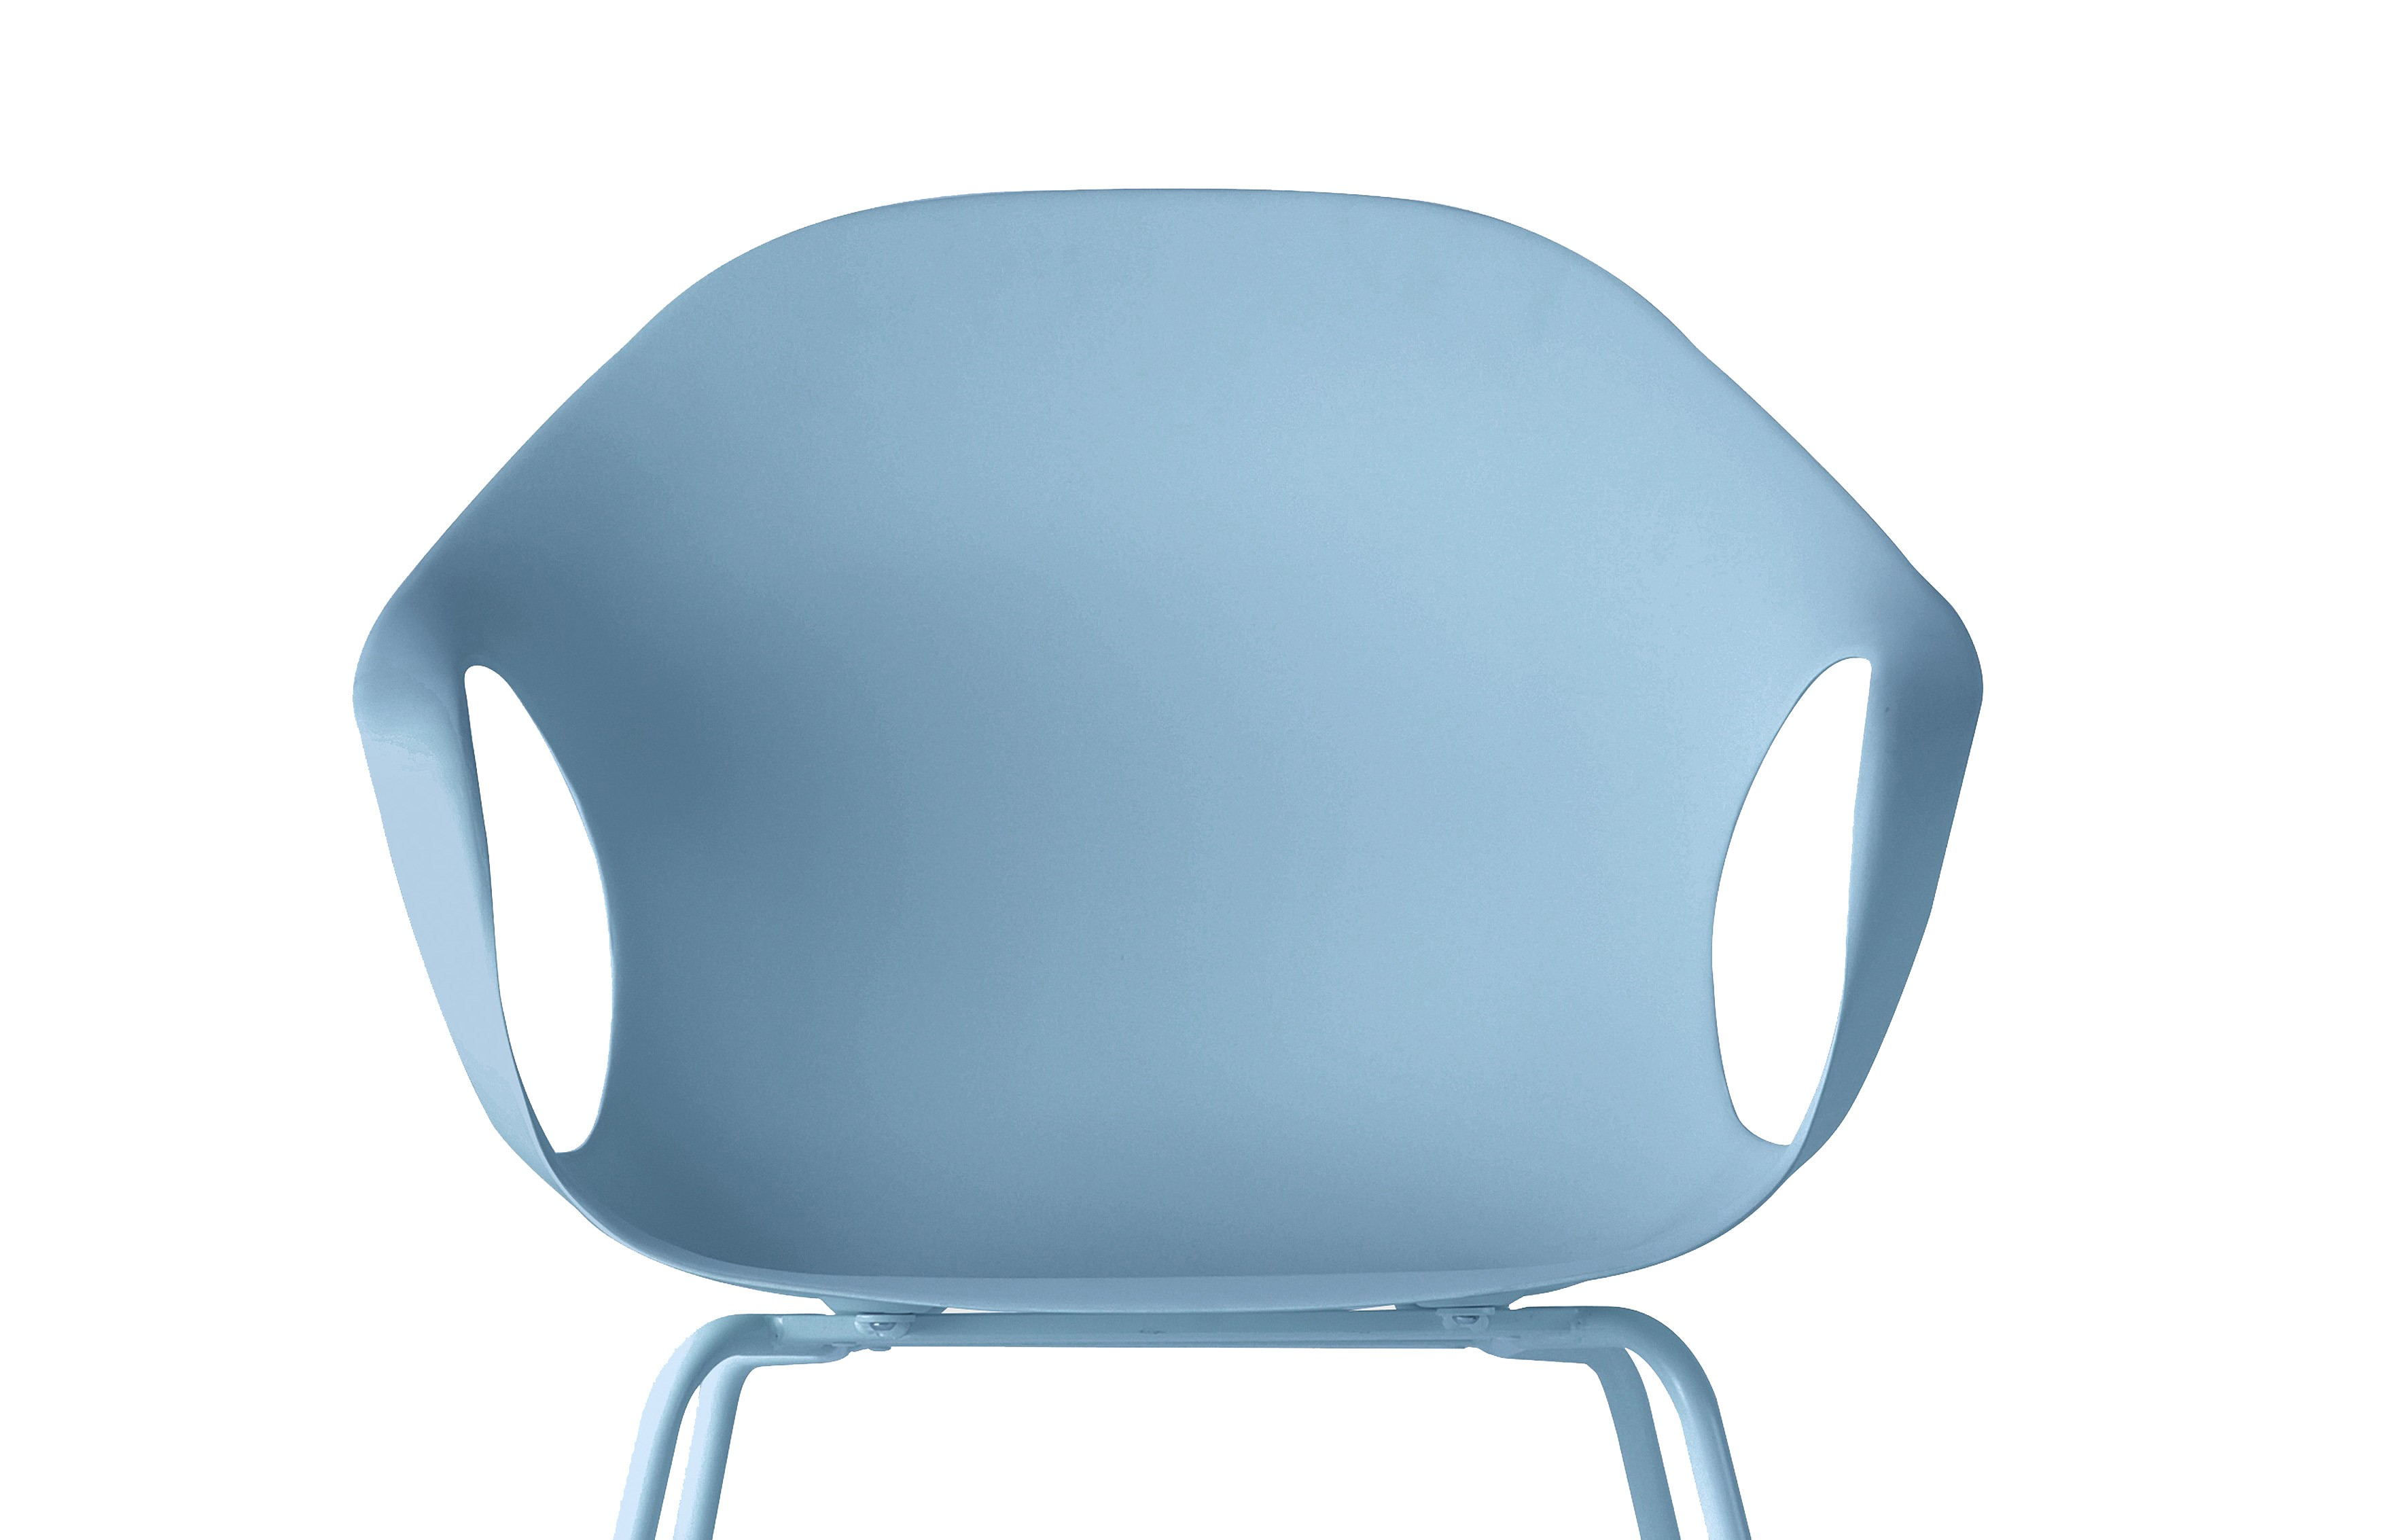 fauteuil elephant de kristalia pieds droits en acier laqu bleu ciel. Black Bedroom Furniture Sets. Home Design Ideas